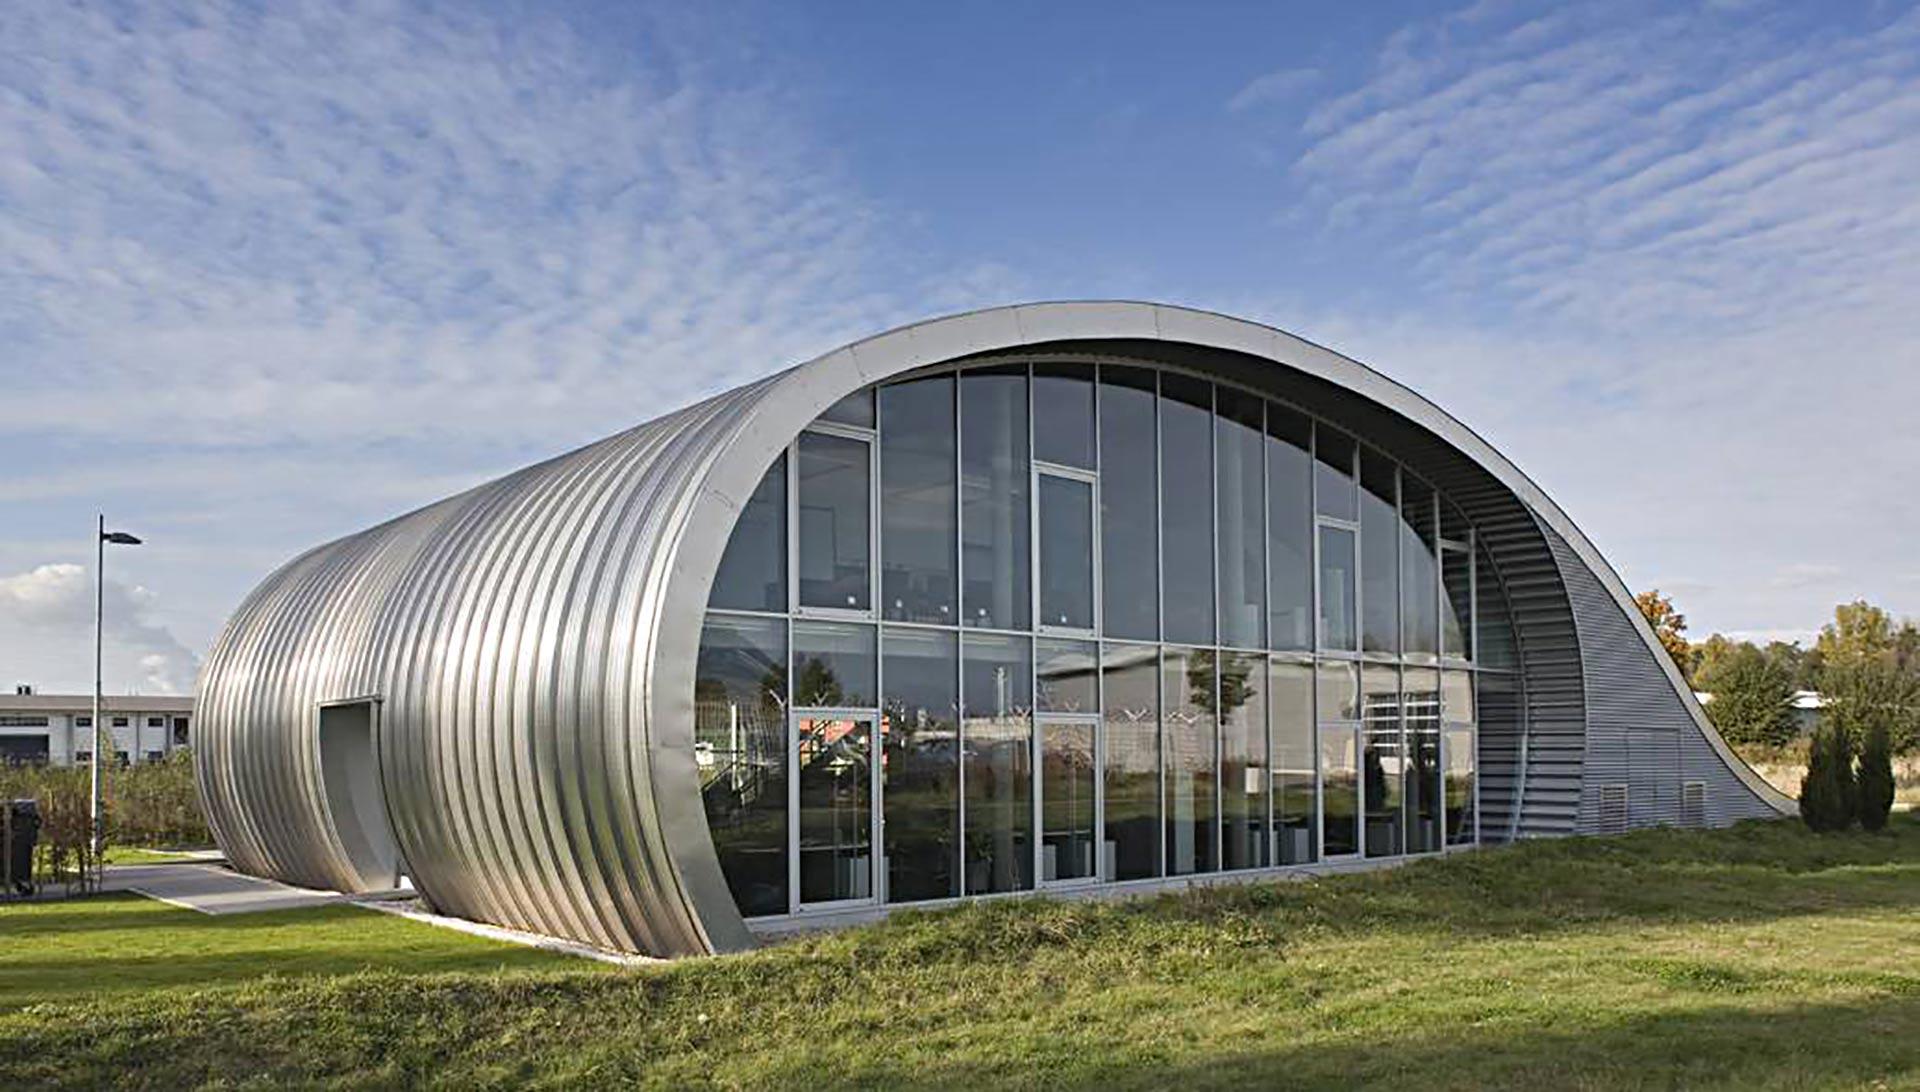 Architekt Oberhausen expert travel oberhausen d ajf architekten